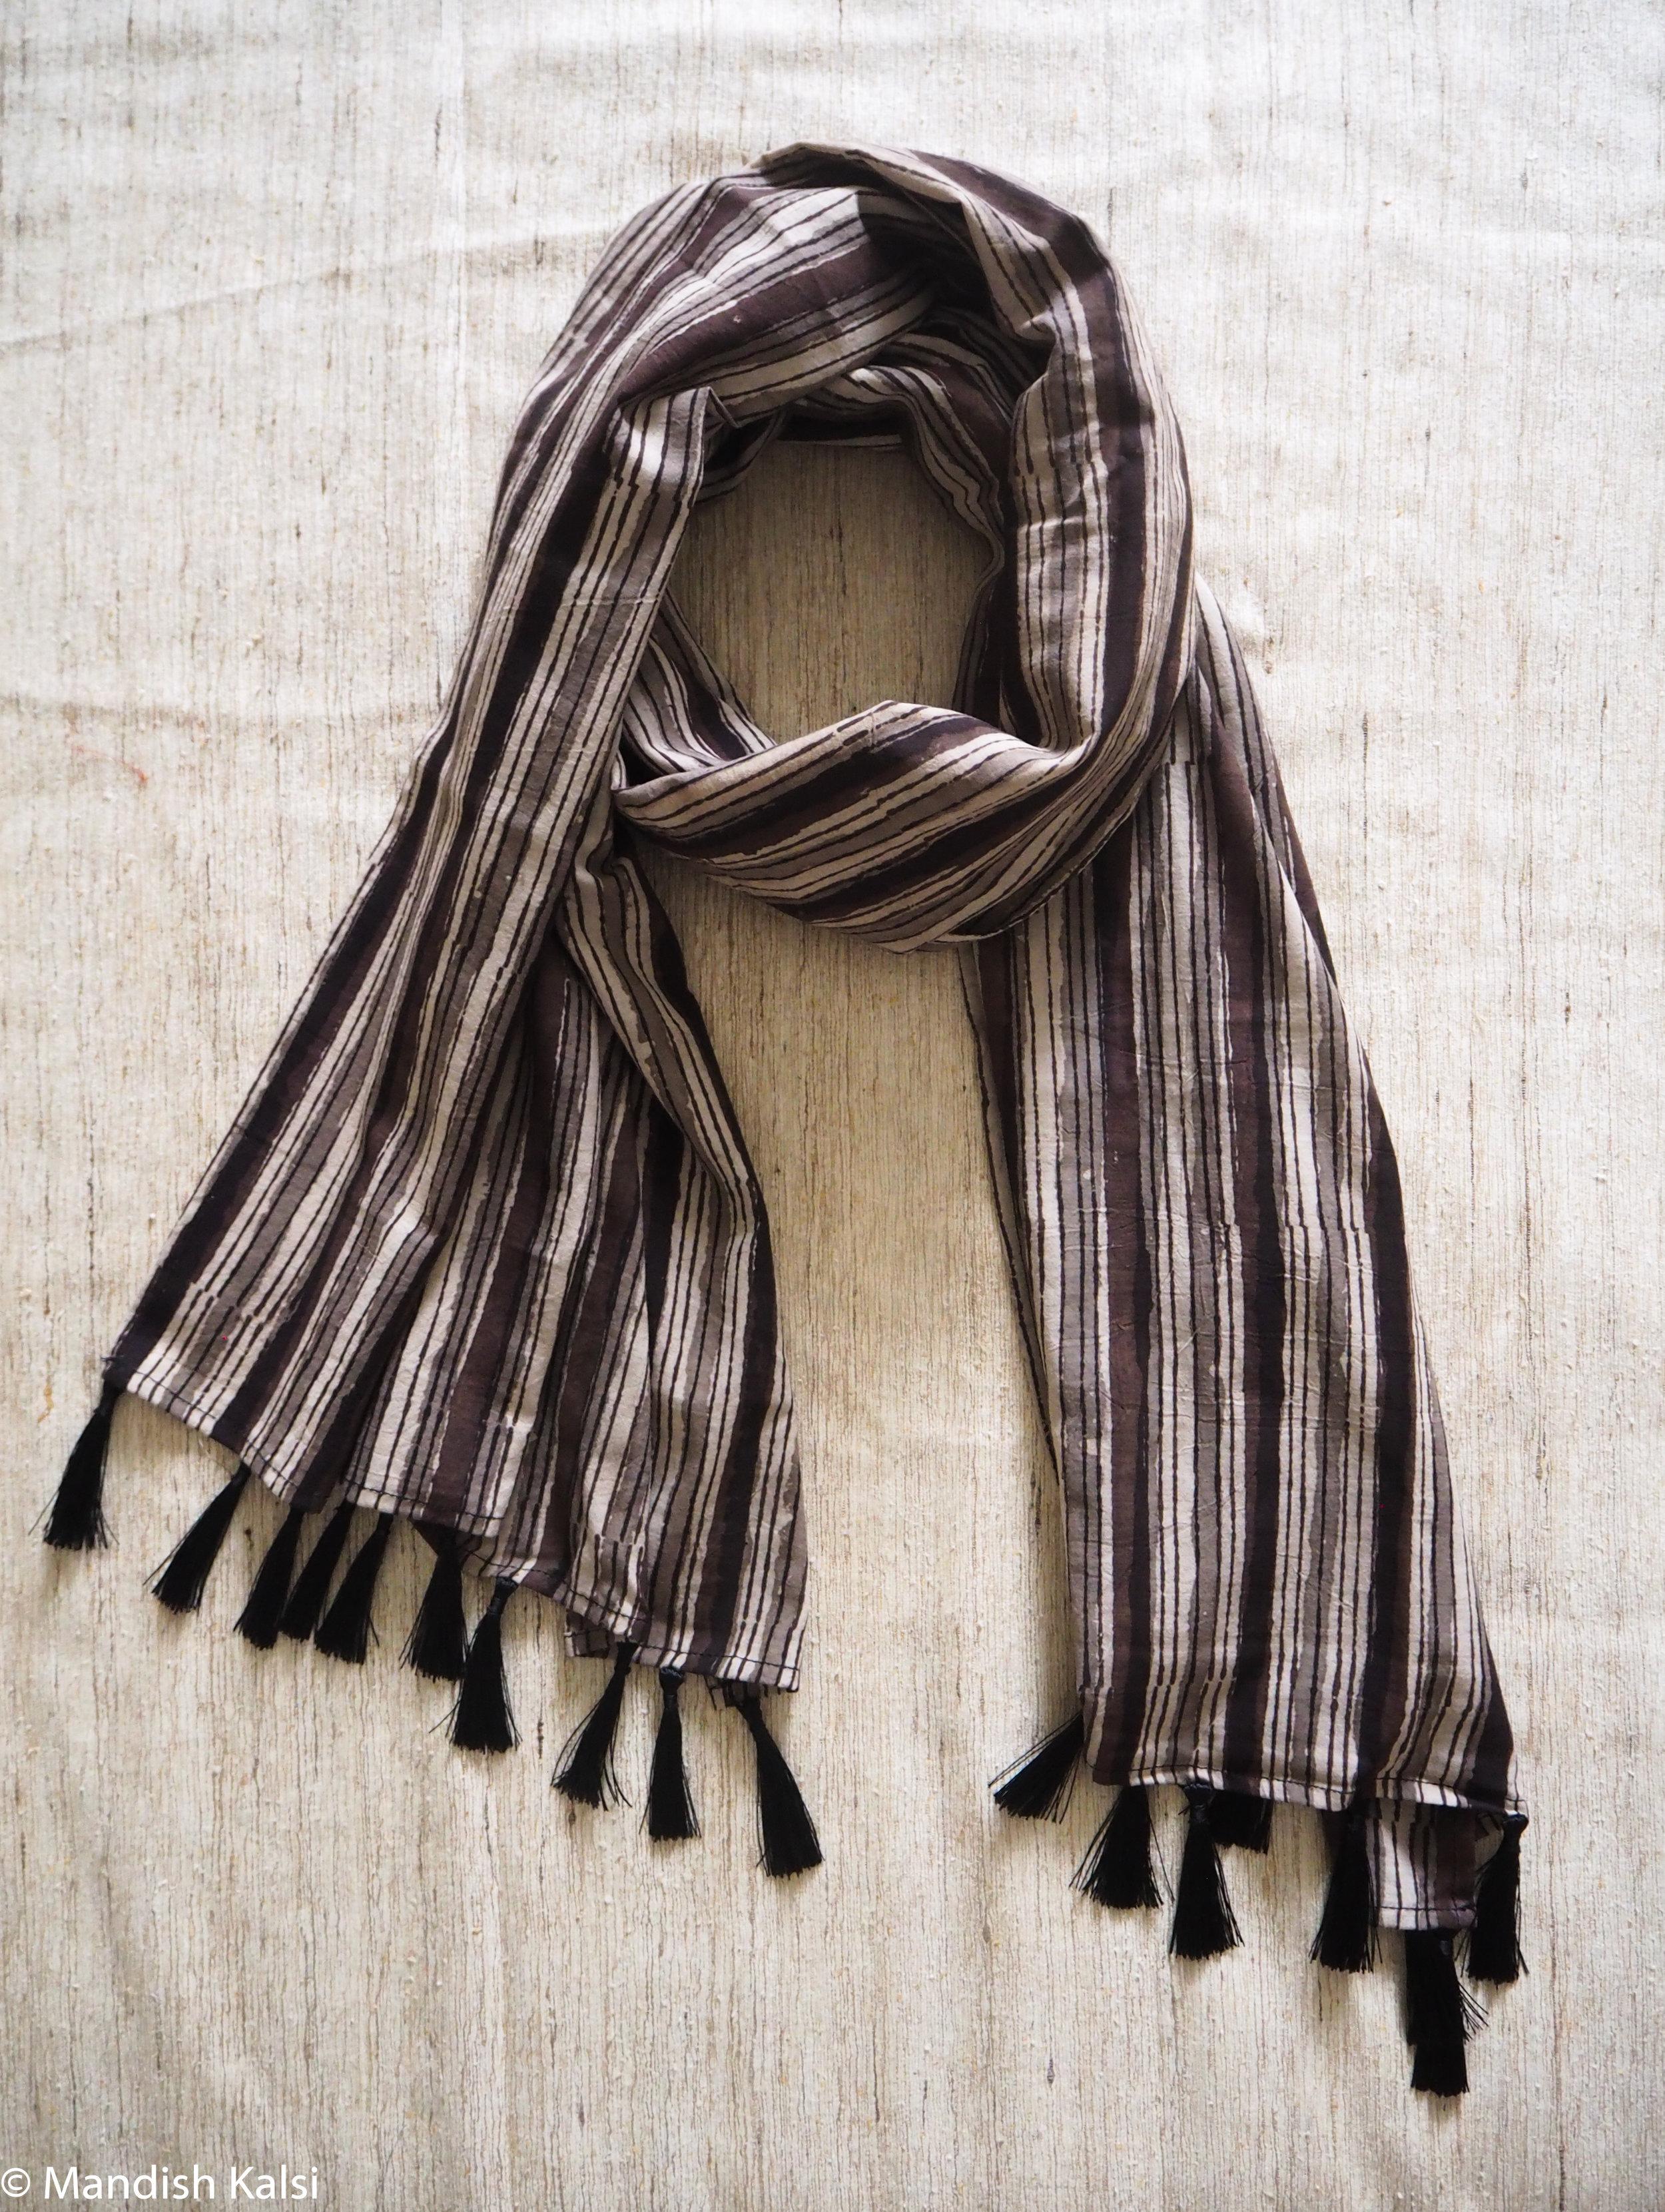 Layered monotone stripe print - Medium scarf with tassels